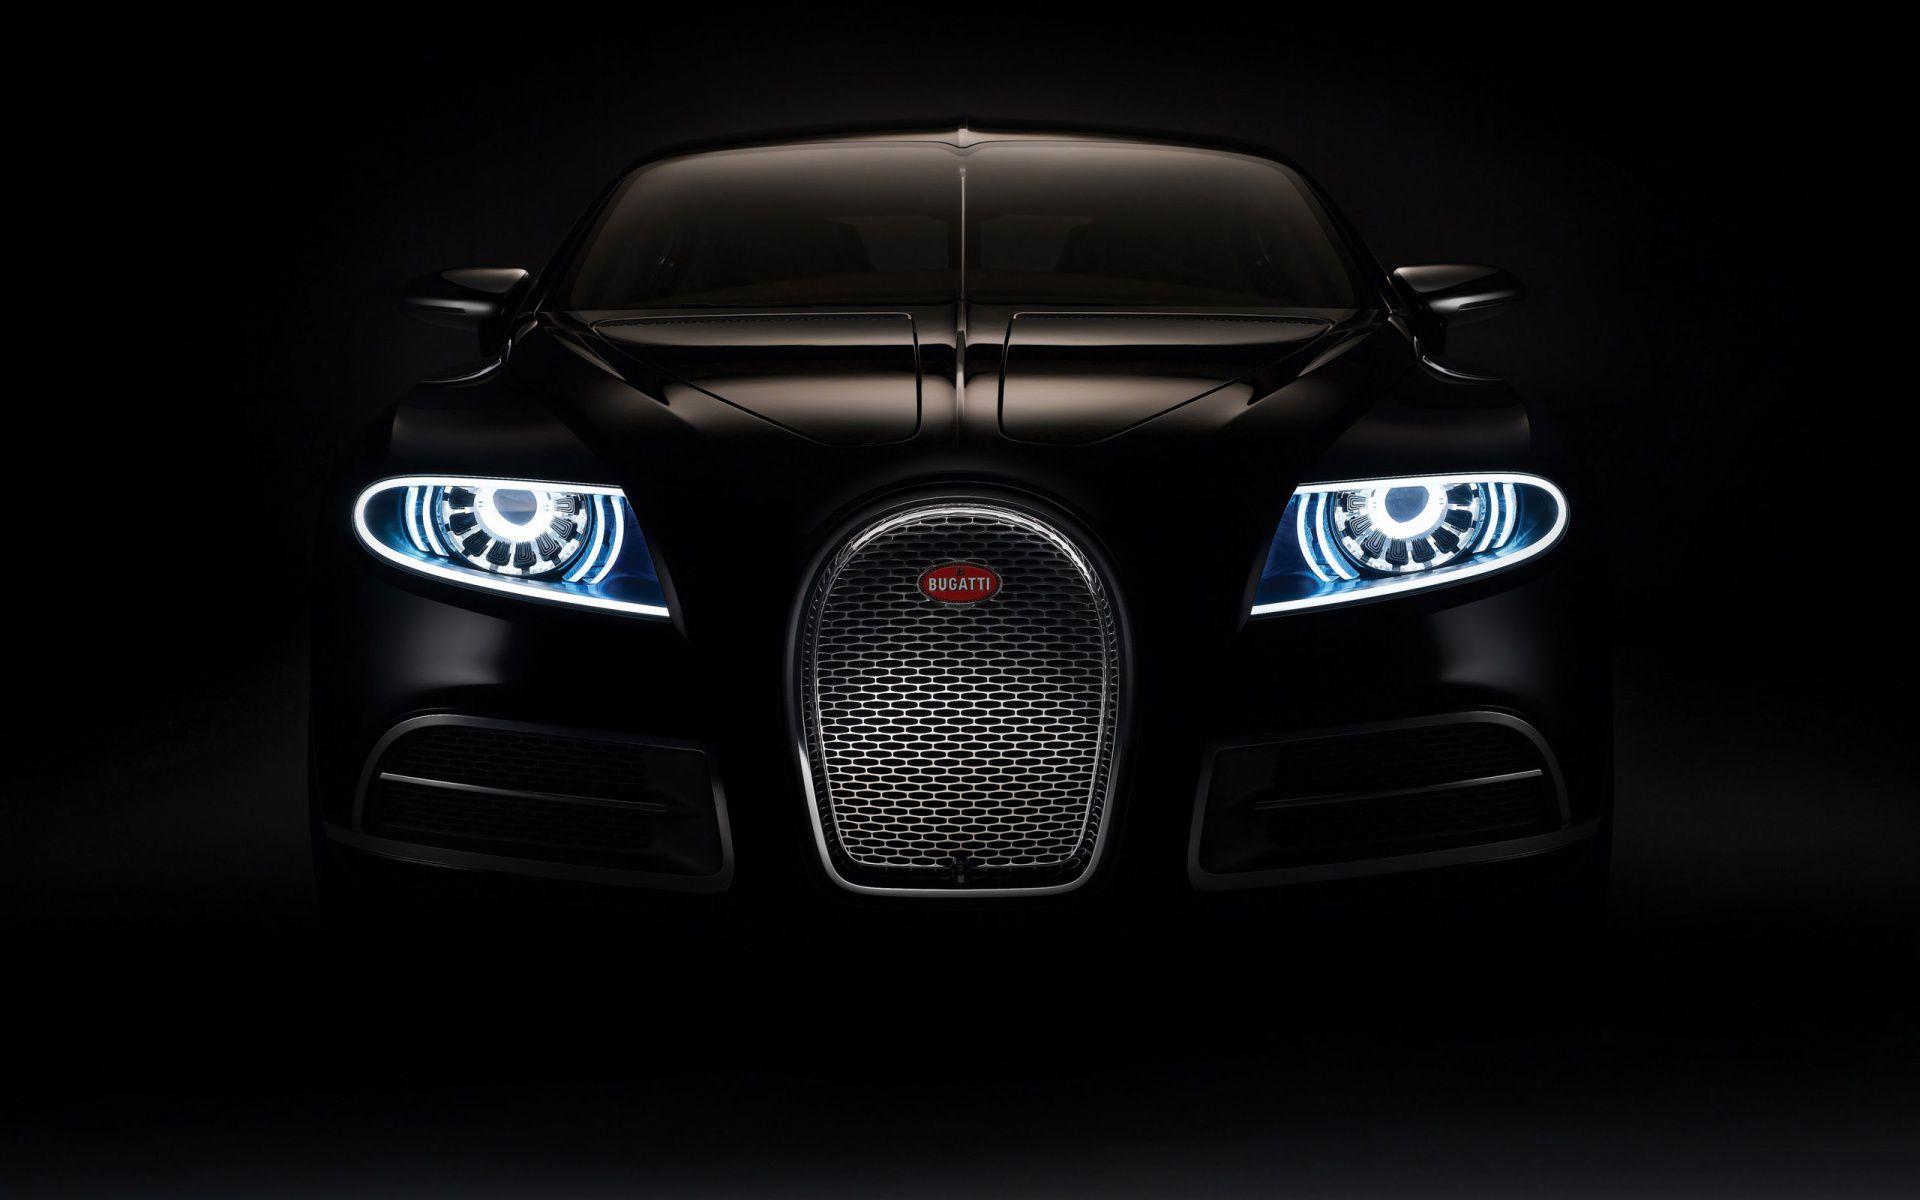 Bugatti Veyron 16C Galibier Bugatti Veyron Black Front Car Wallpaper 1920x1200